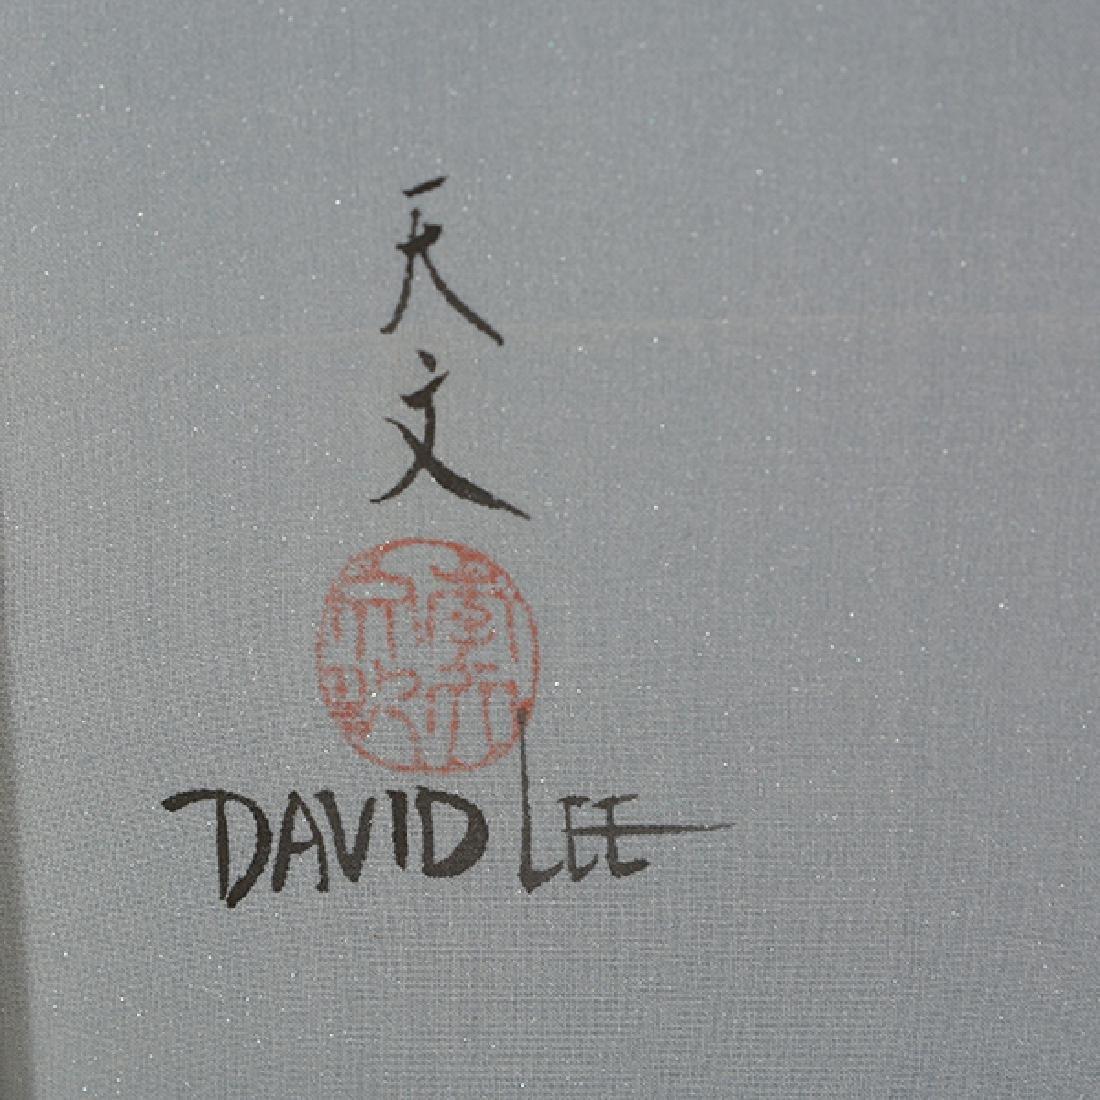 David Lee (b. 1944): Flowers - 2